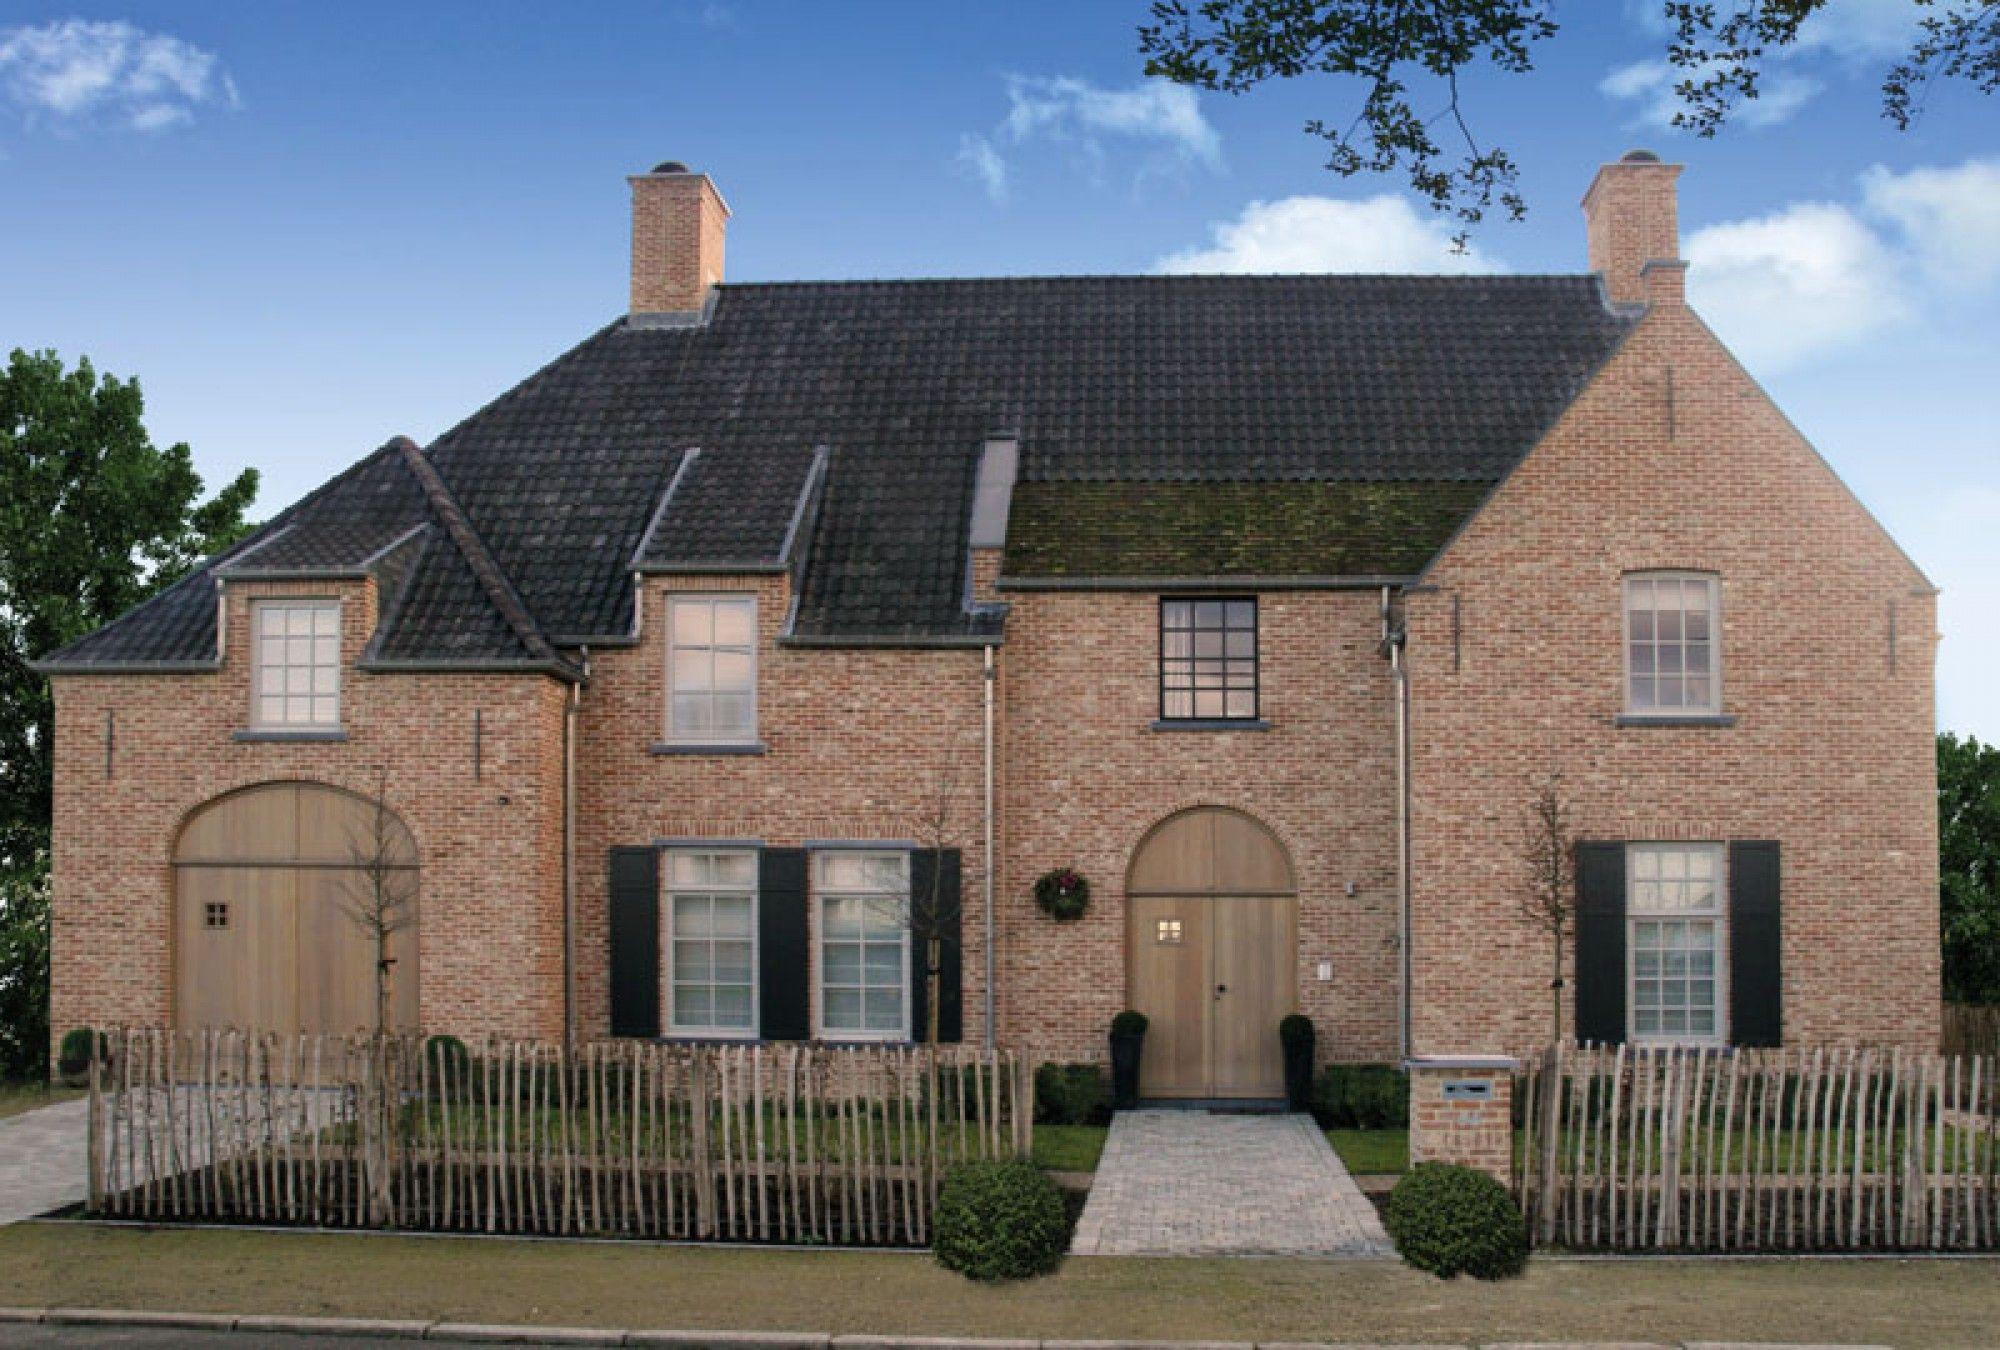 Landelijke villa av00 architectuur pinterest huizen for Landelijke villa bouwen